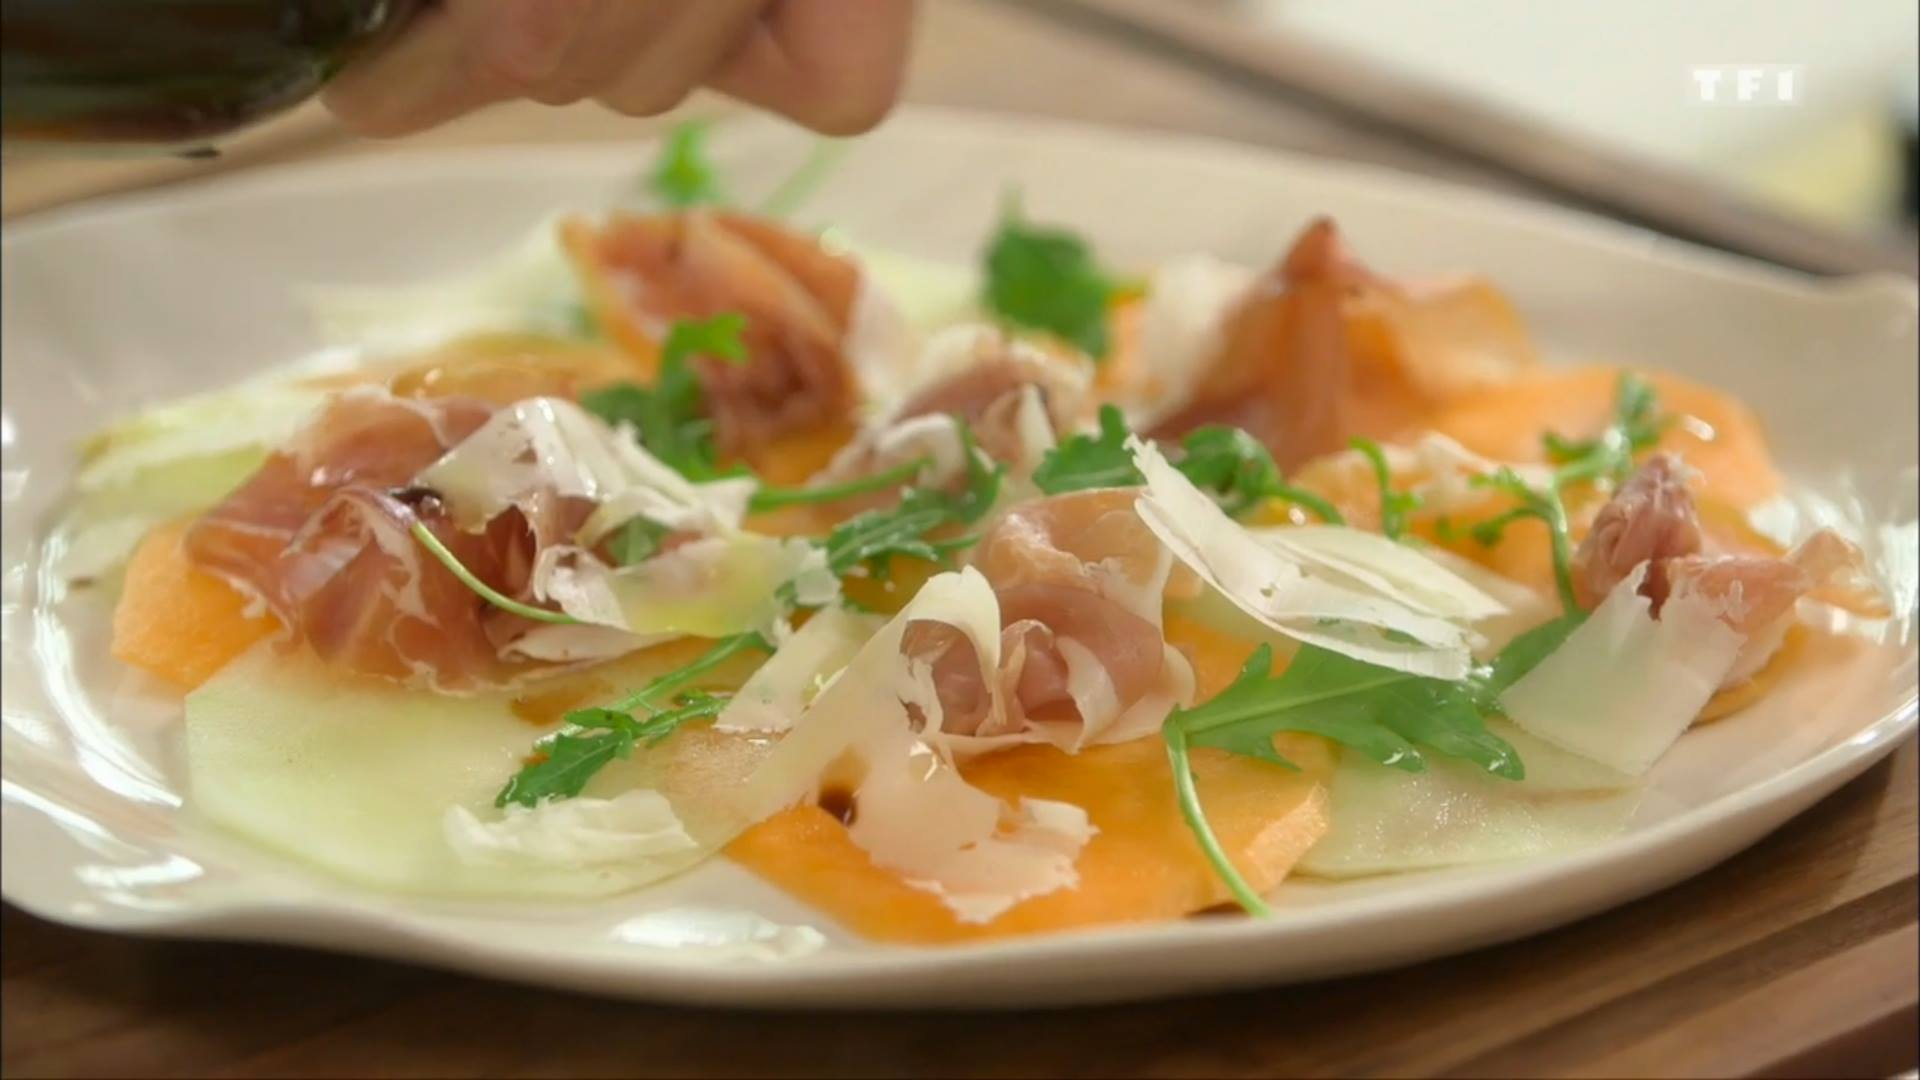 Petits plats en quilibre - Laurent mariotte cuisine tf1 ...